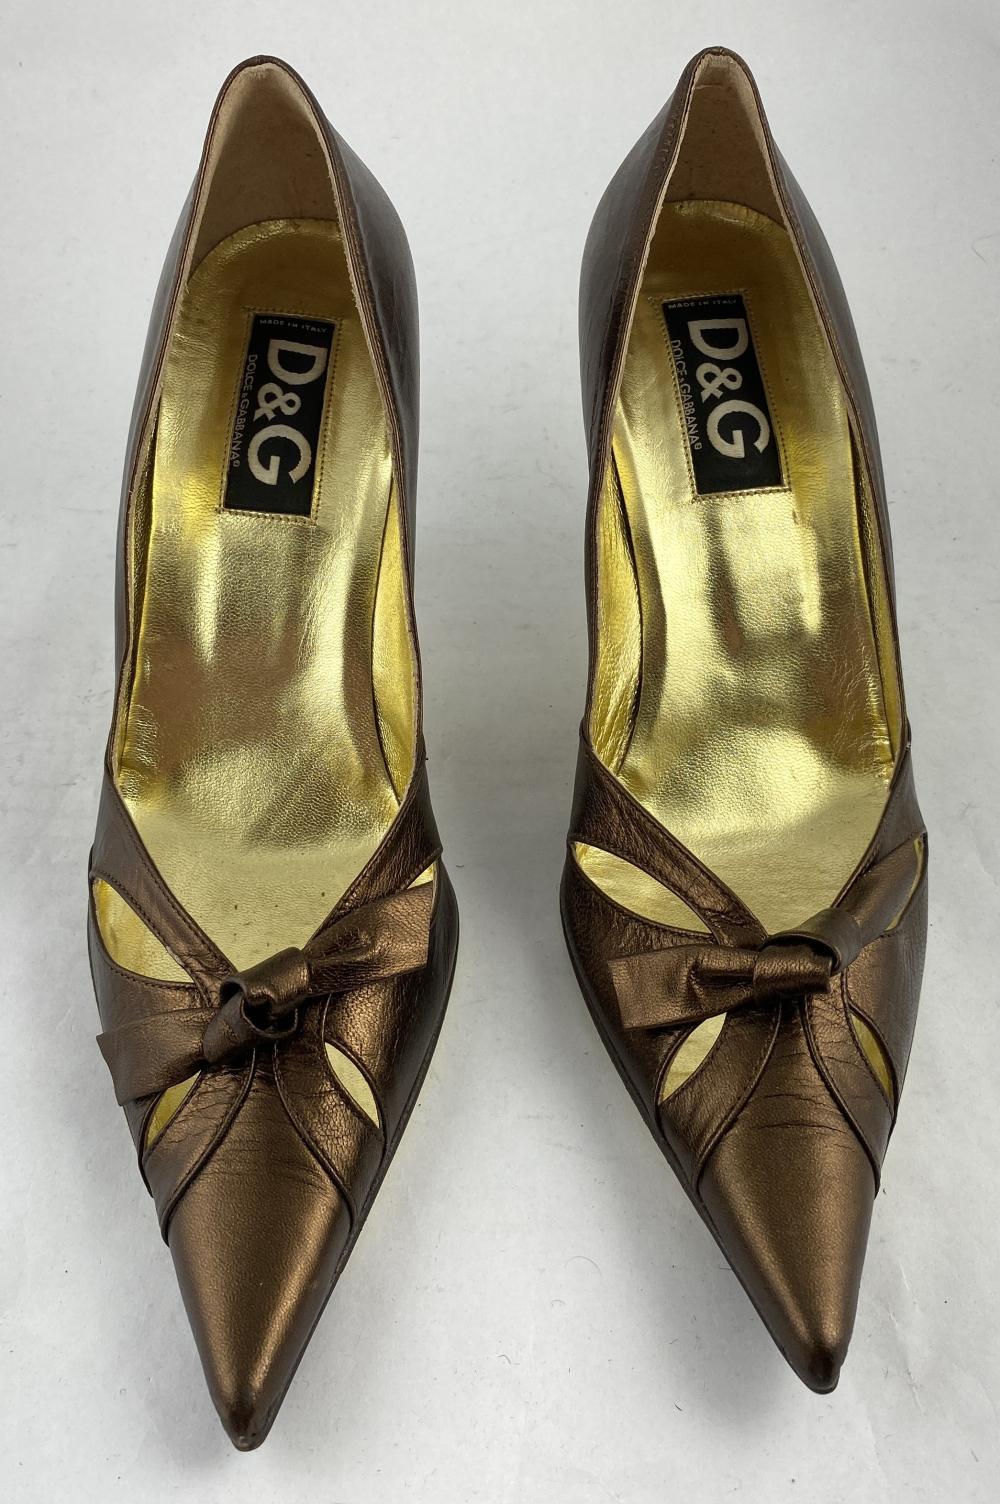 Dolce & Gabbana, Italy: Bronzetone Leather Point-Toe Stilettos, Bow Detail to Toe